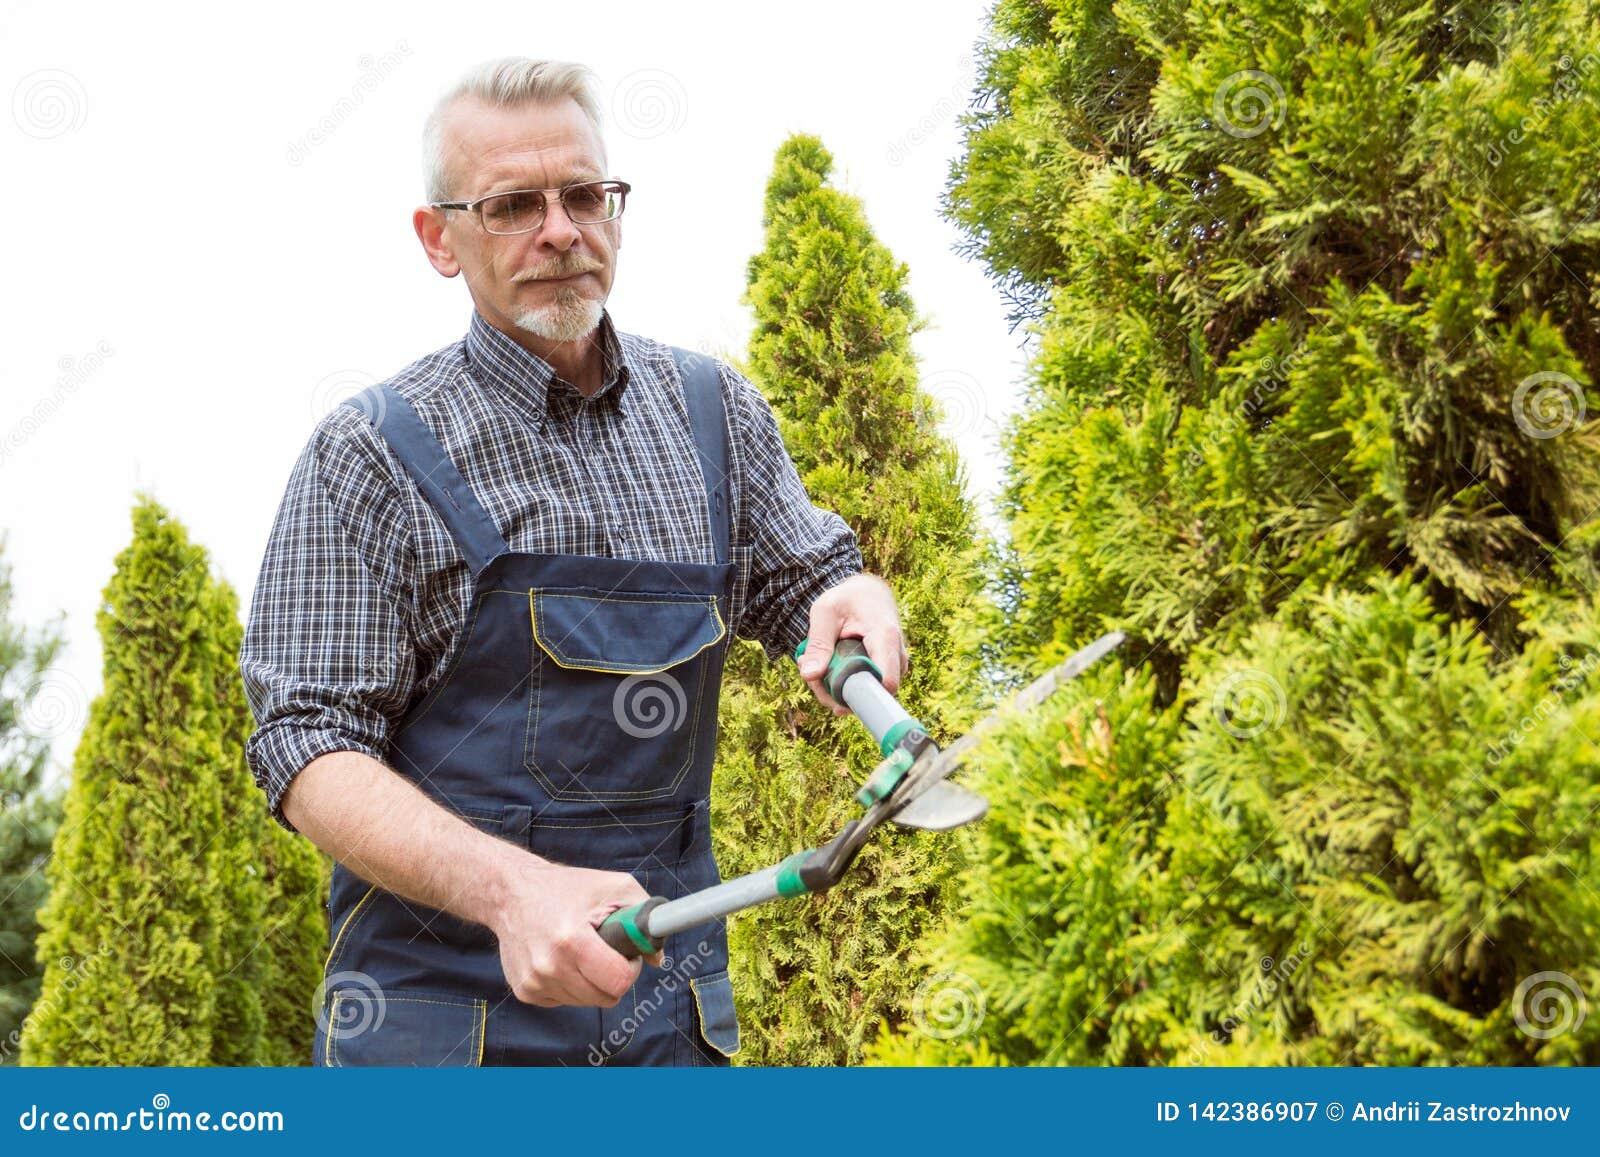 The gardener cuts the trees shears